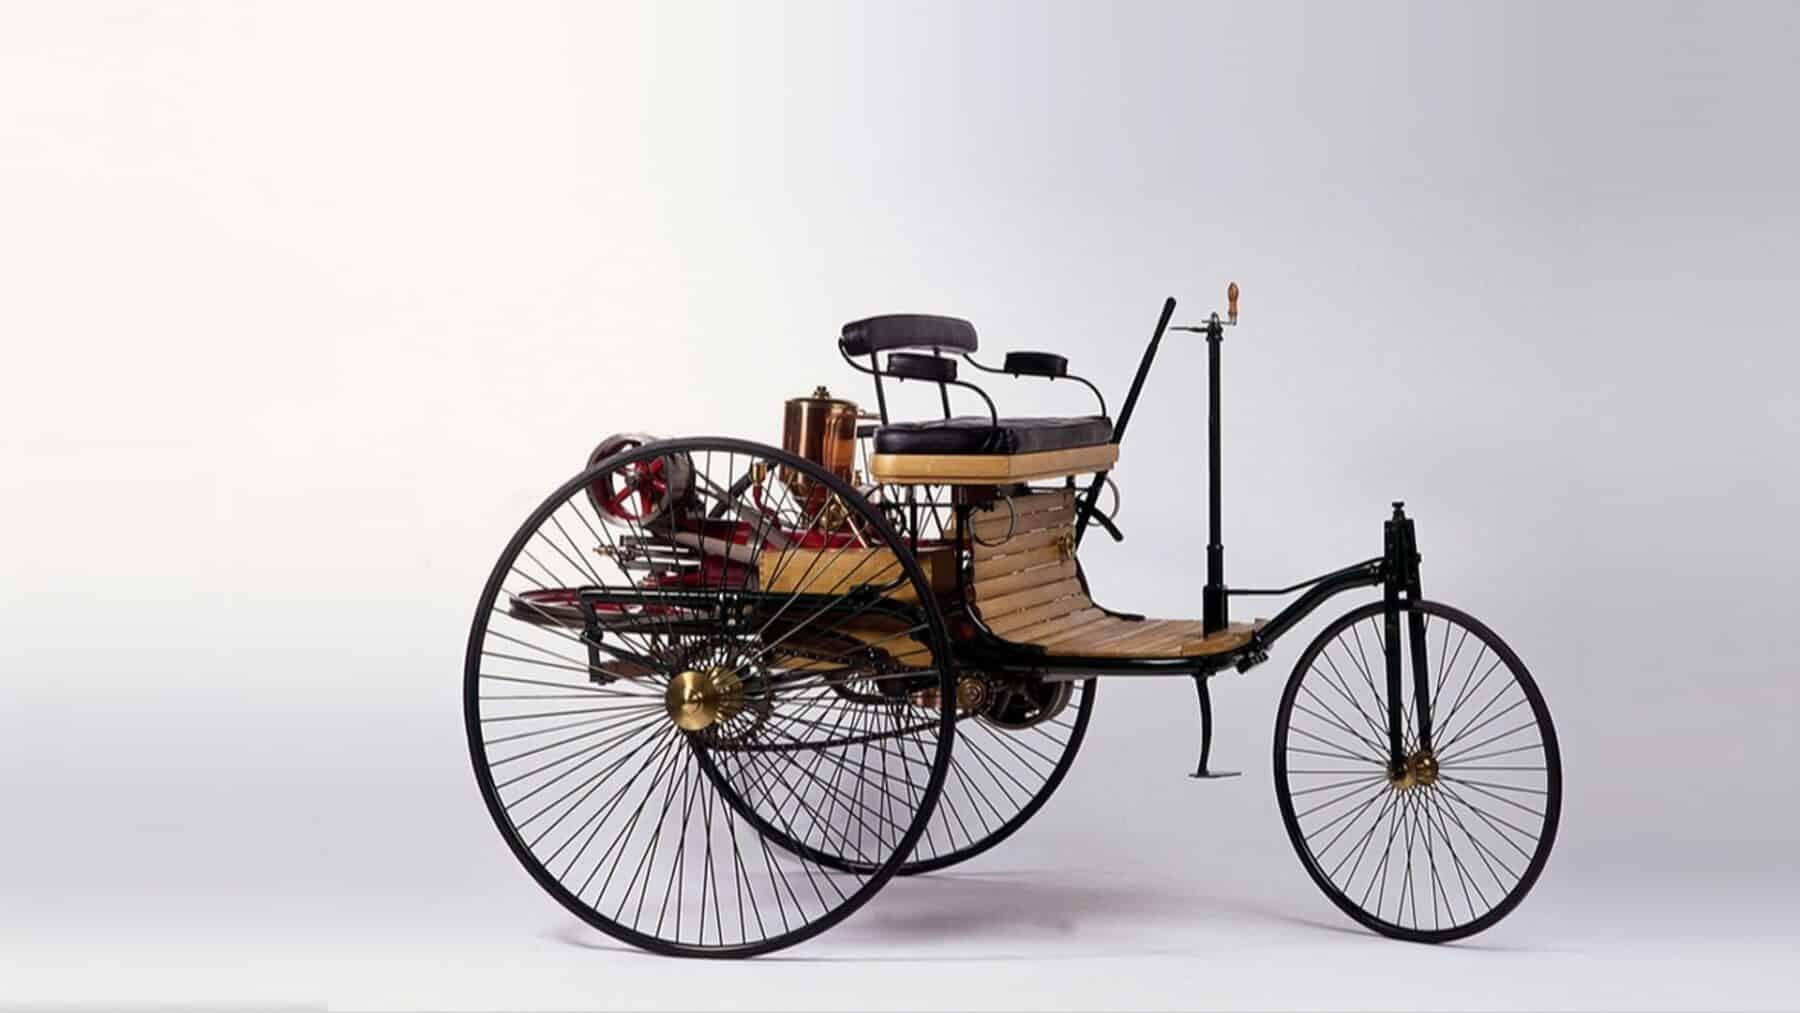 Mercedes inventó el primer automóvil moderno